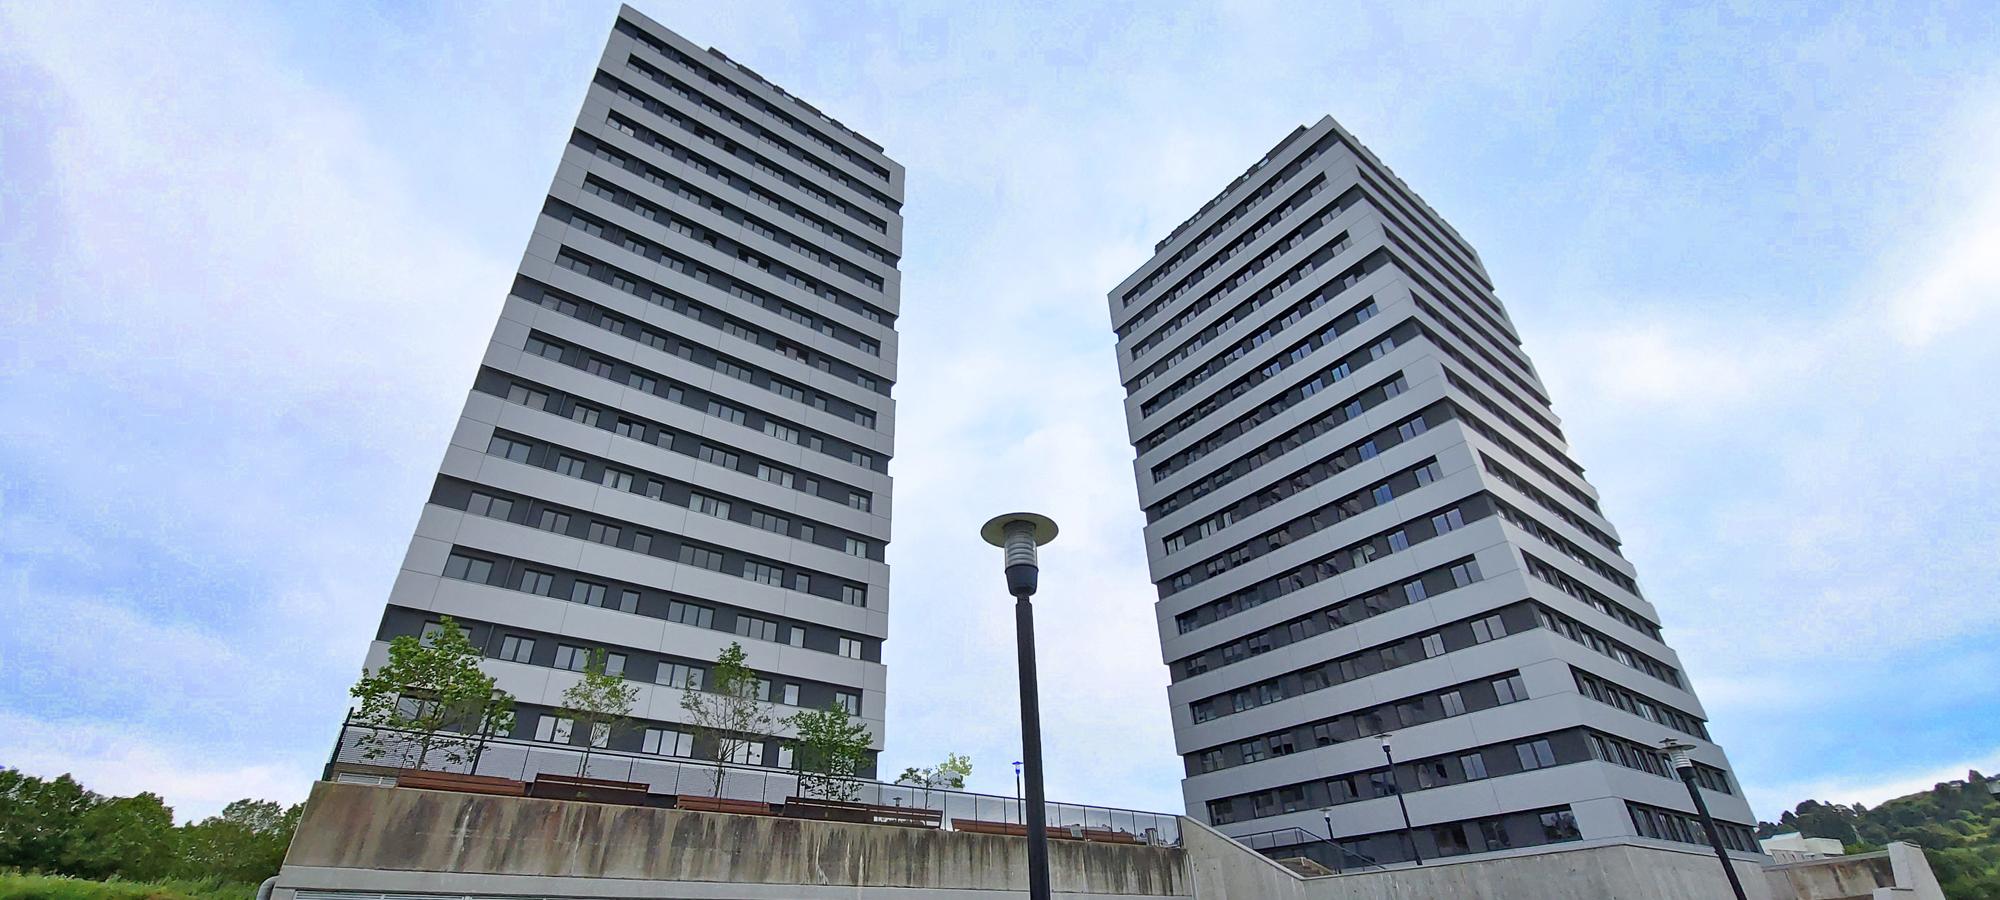 Venta de pisos torre somesco